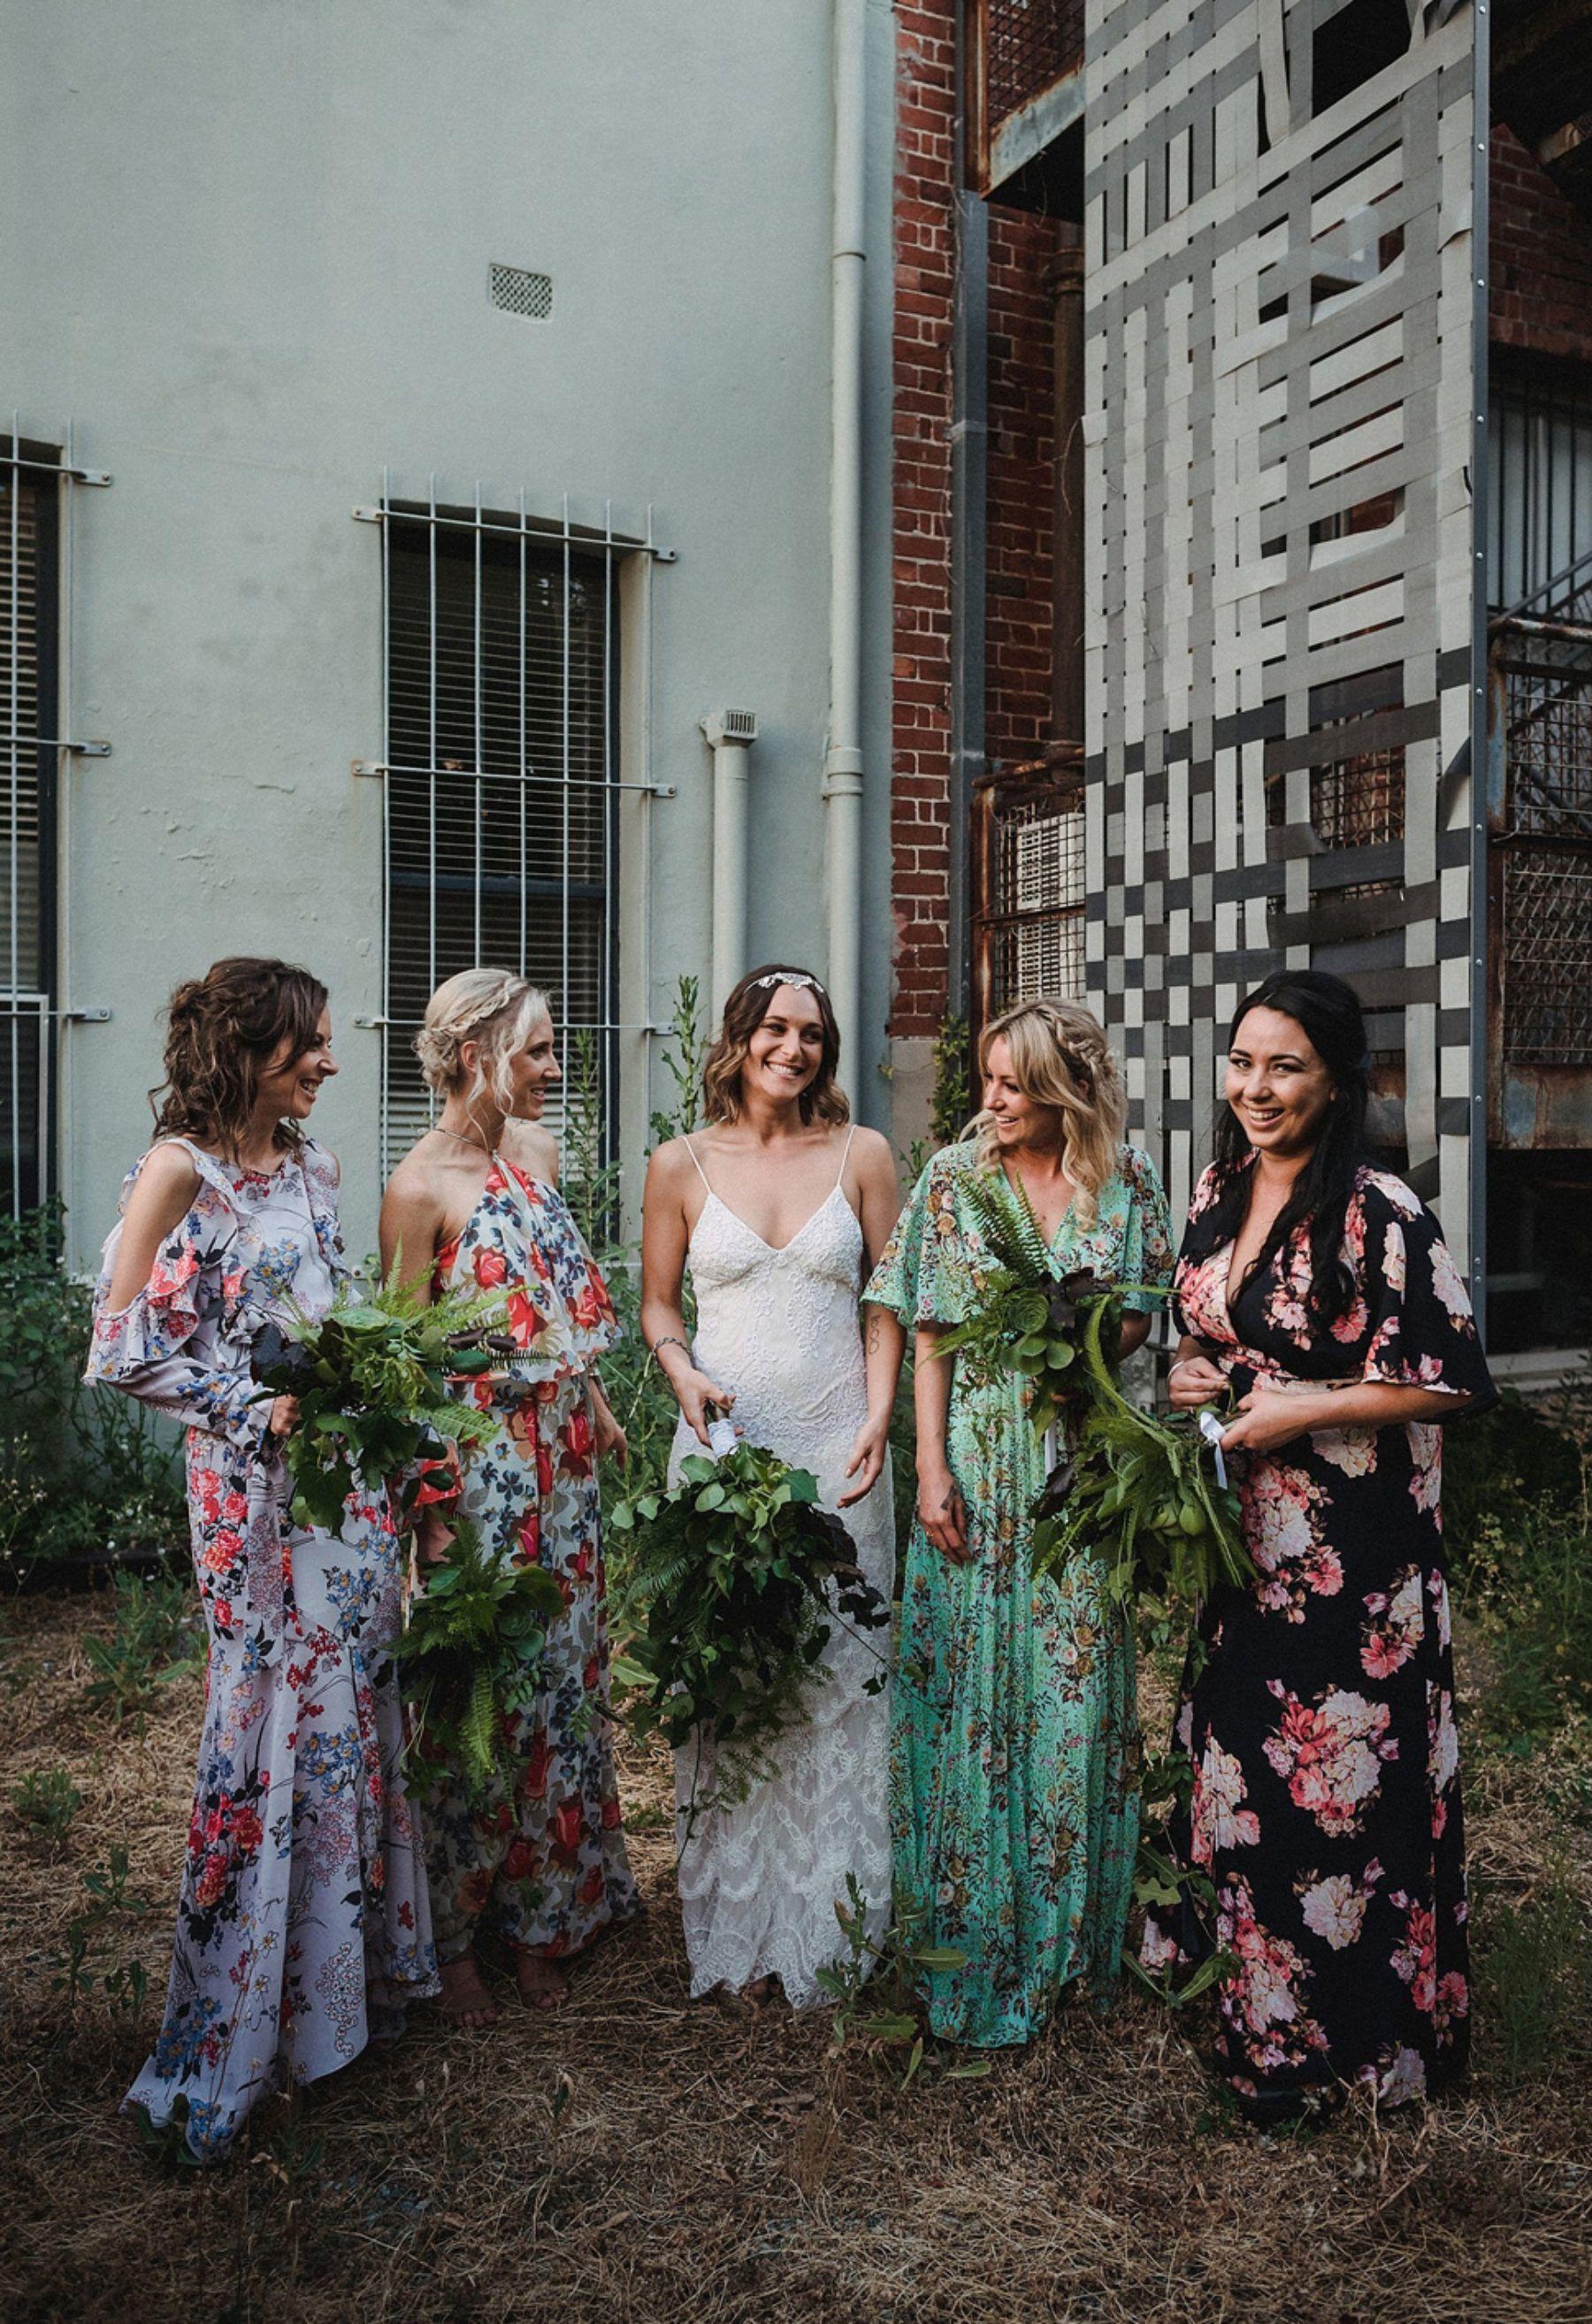 Best Of 2017 Bridesmaids Nouba Com Au Floral Bridesmaid Dresses Bridesmaid Dresses Color Palette Bridesmaid Dresses Boho